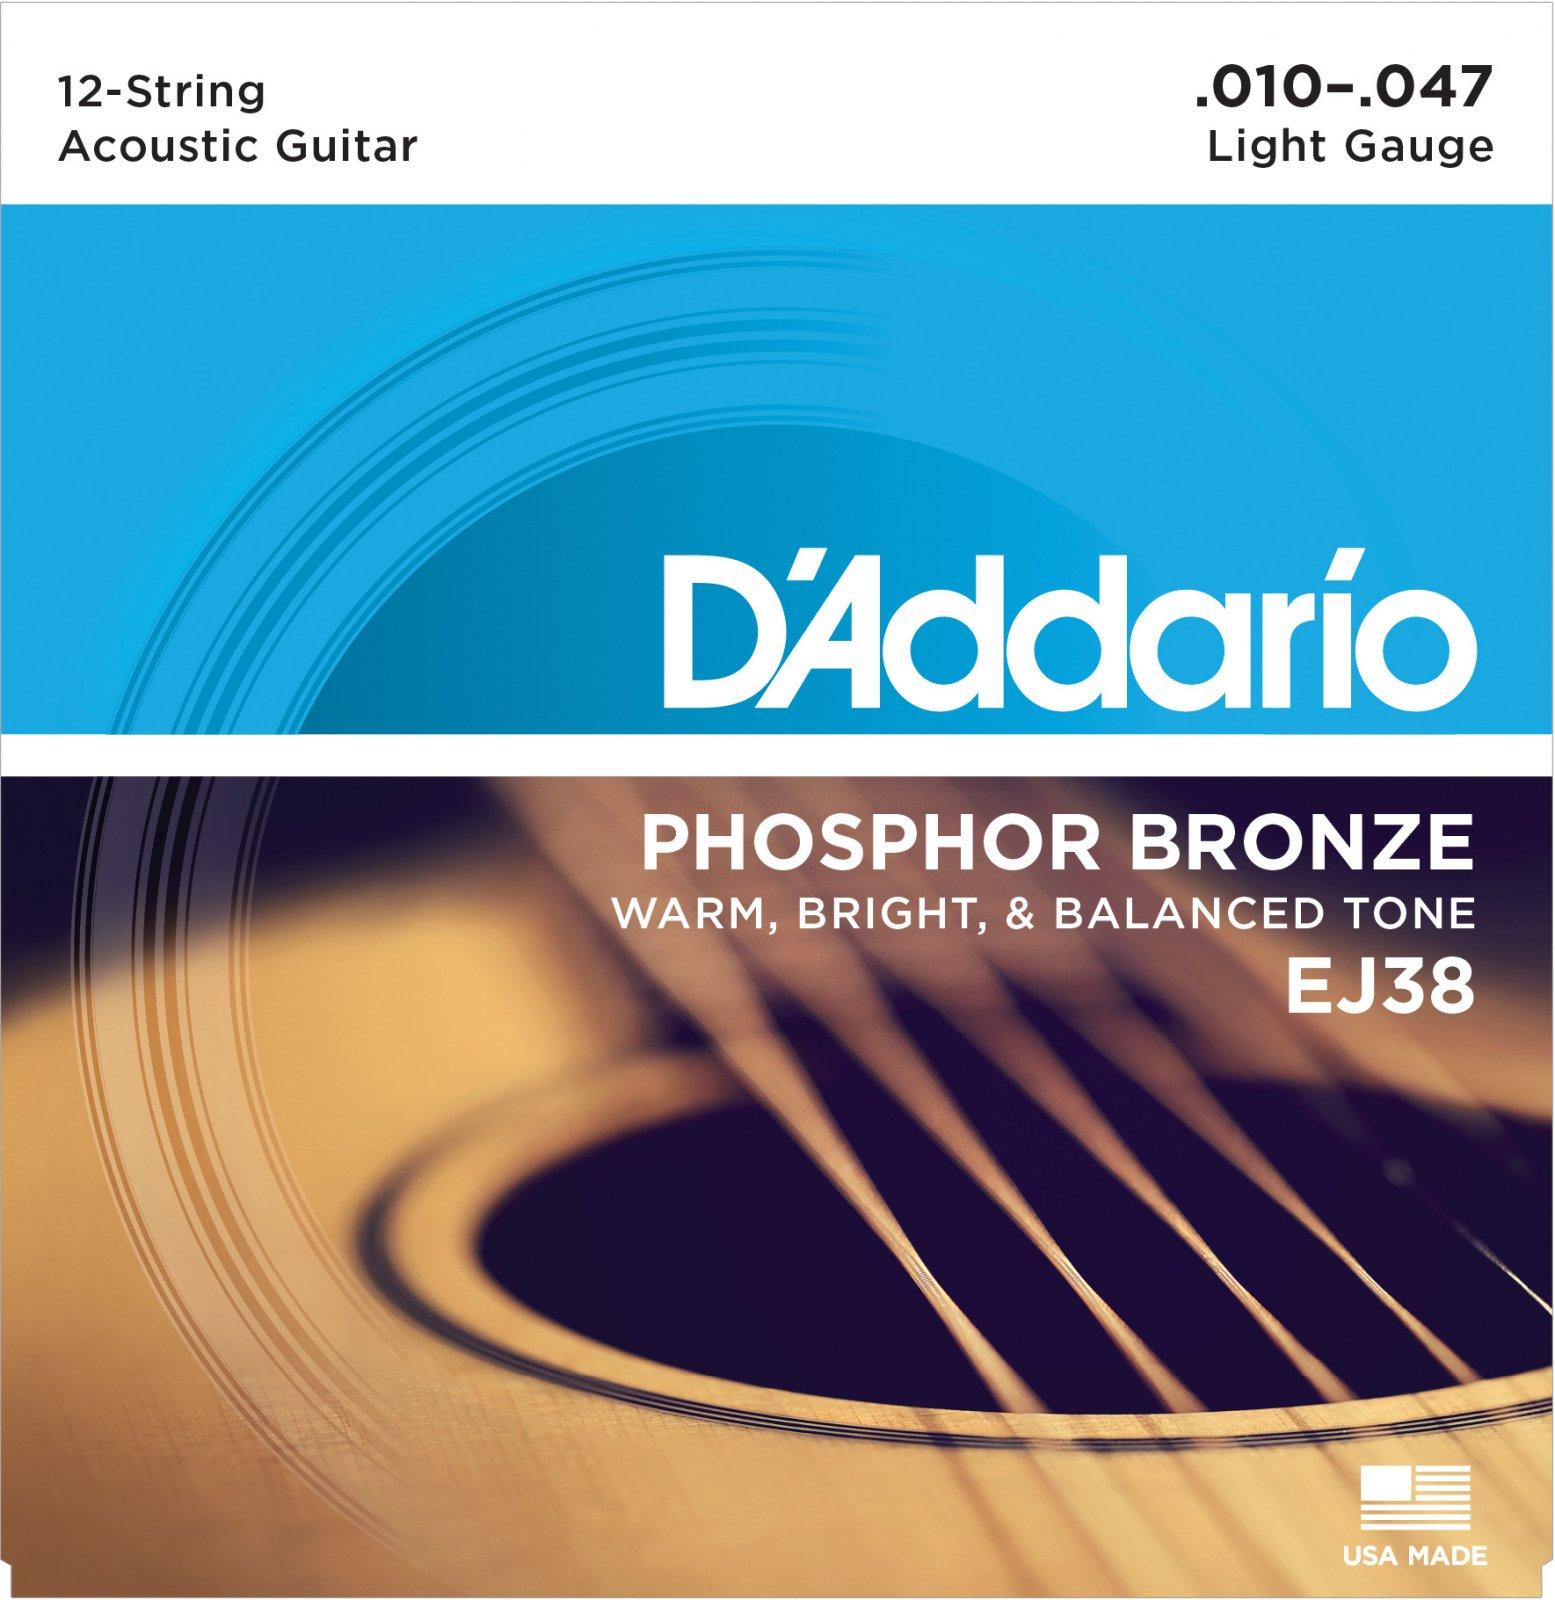 D'addario EJ38 Phosphor Bronze 12-String Acoustic Guitar Strings, Light, 10-47